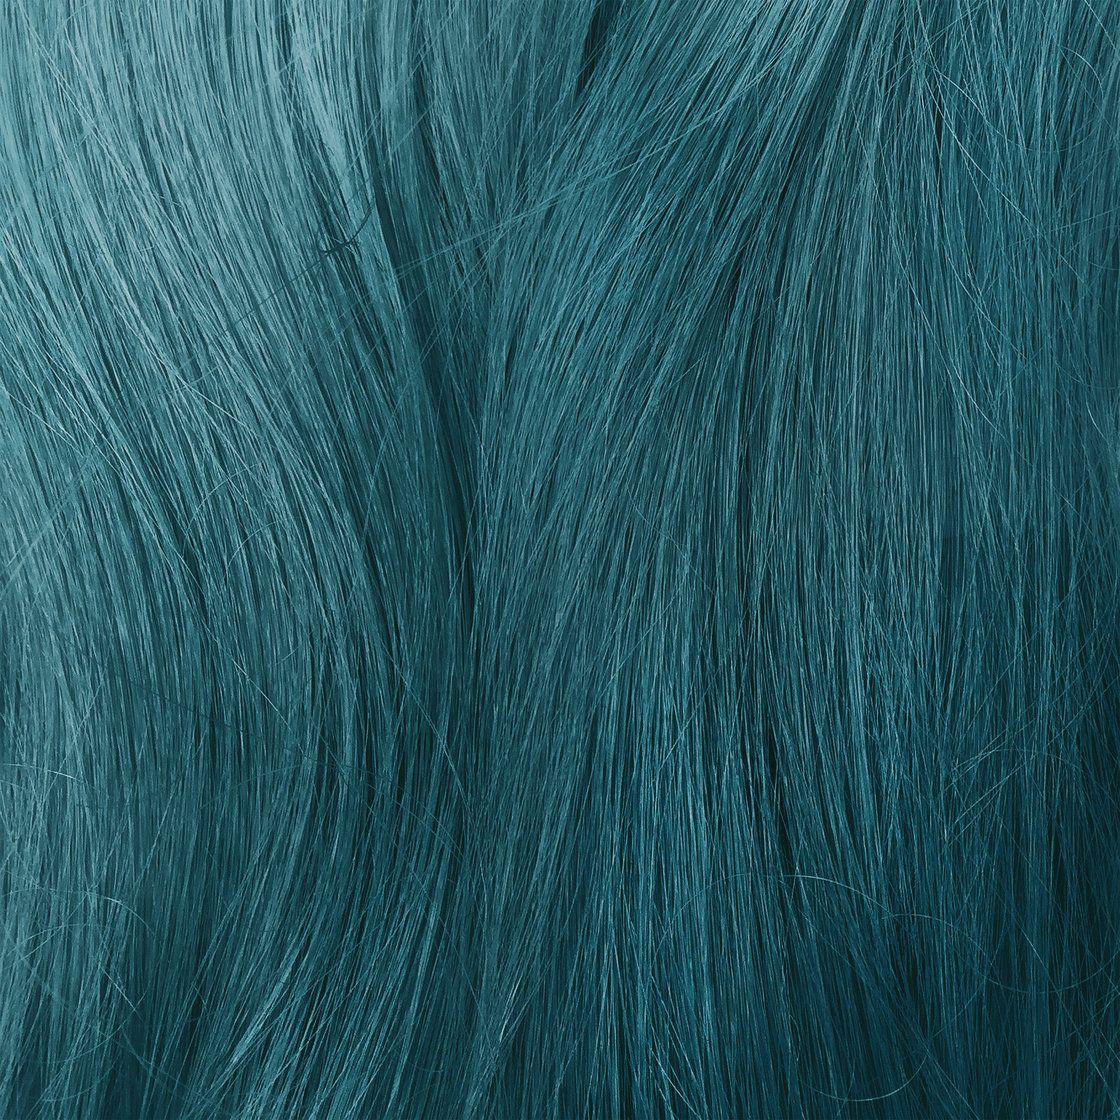 Unicorn hair dye sample dirty mermaid seafoam green vegan cruelty